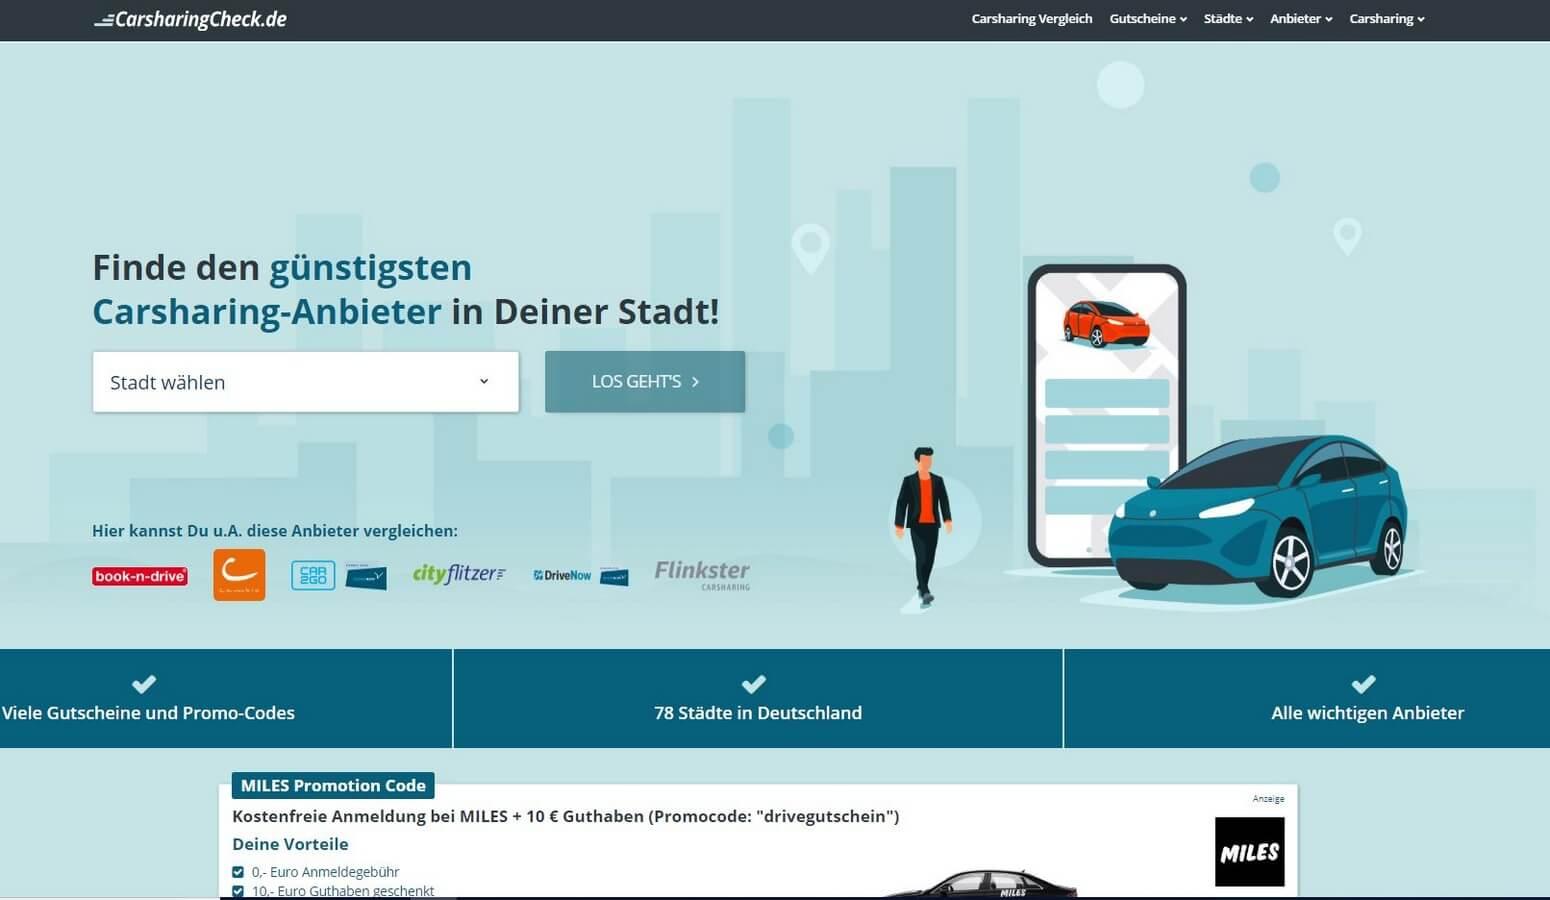 Carsharingcheck.deJPG